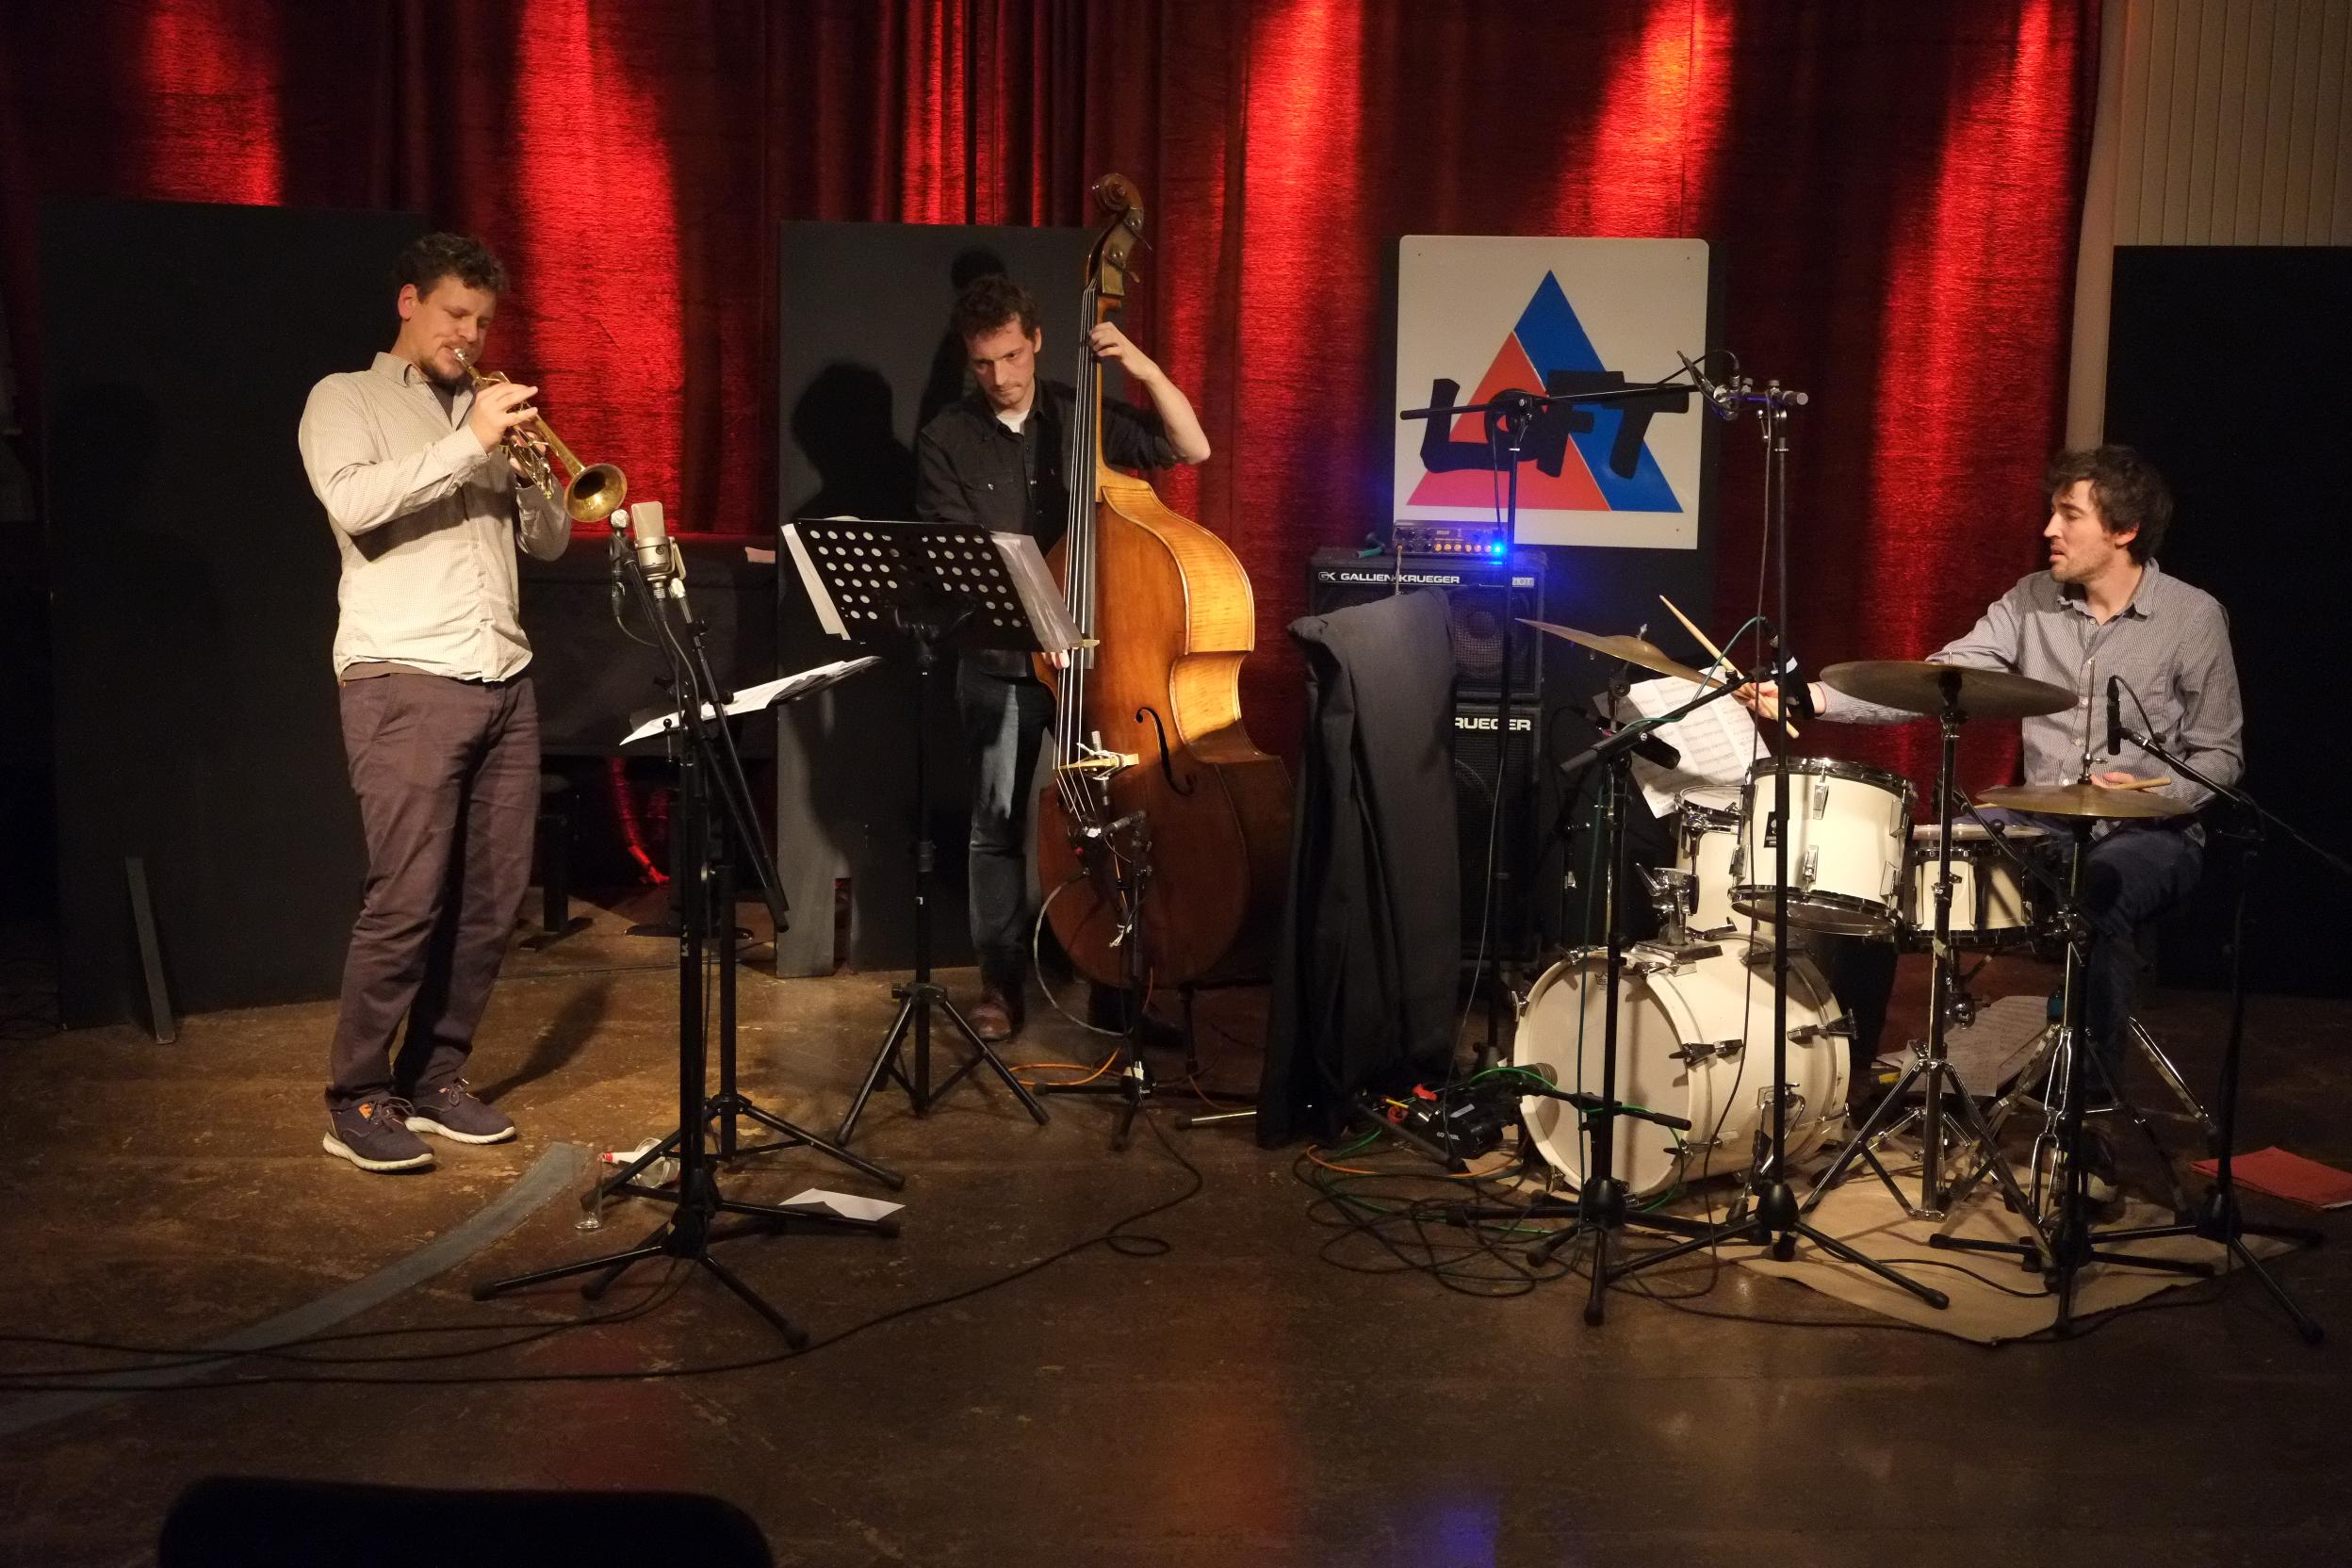 The Bastian Stein Trio